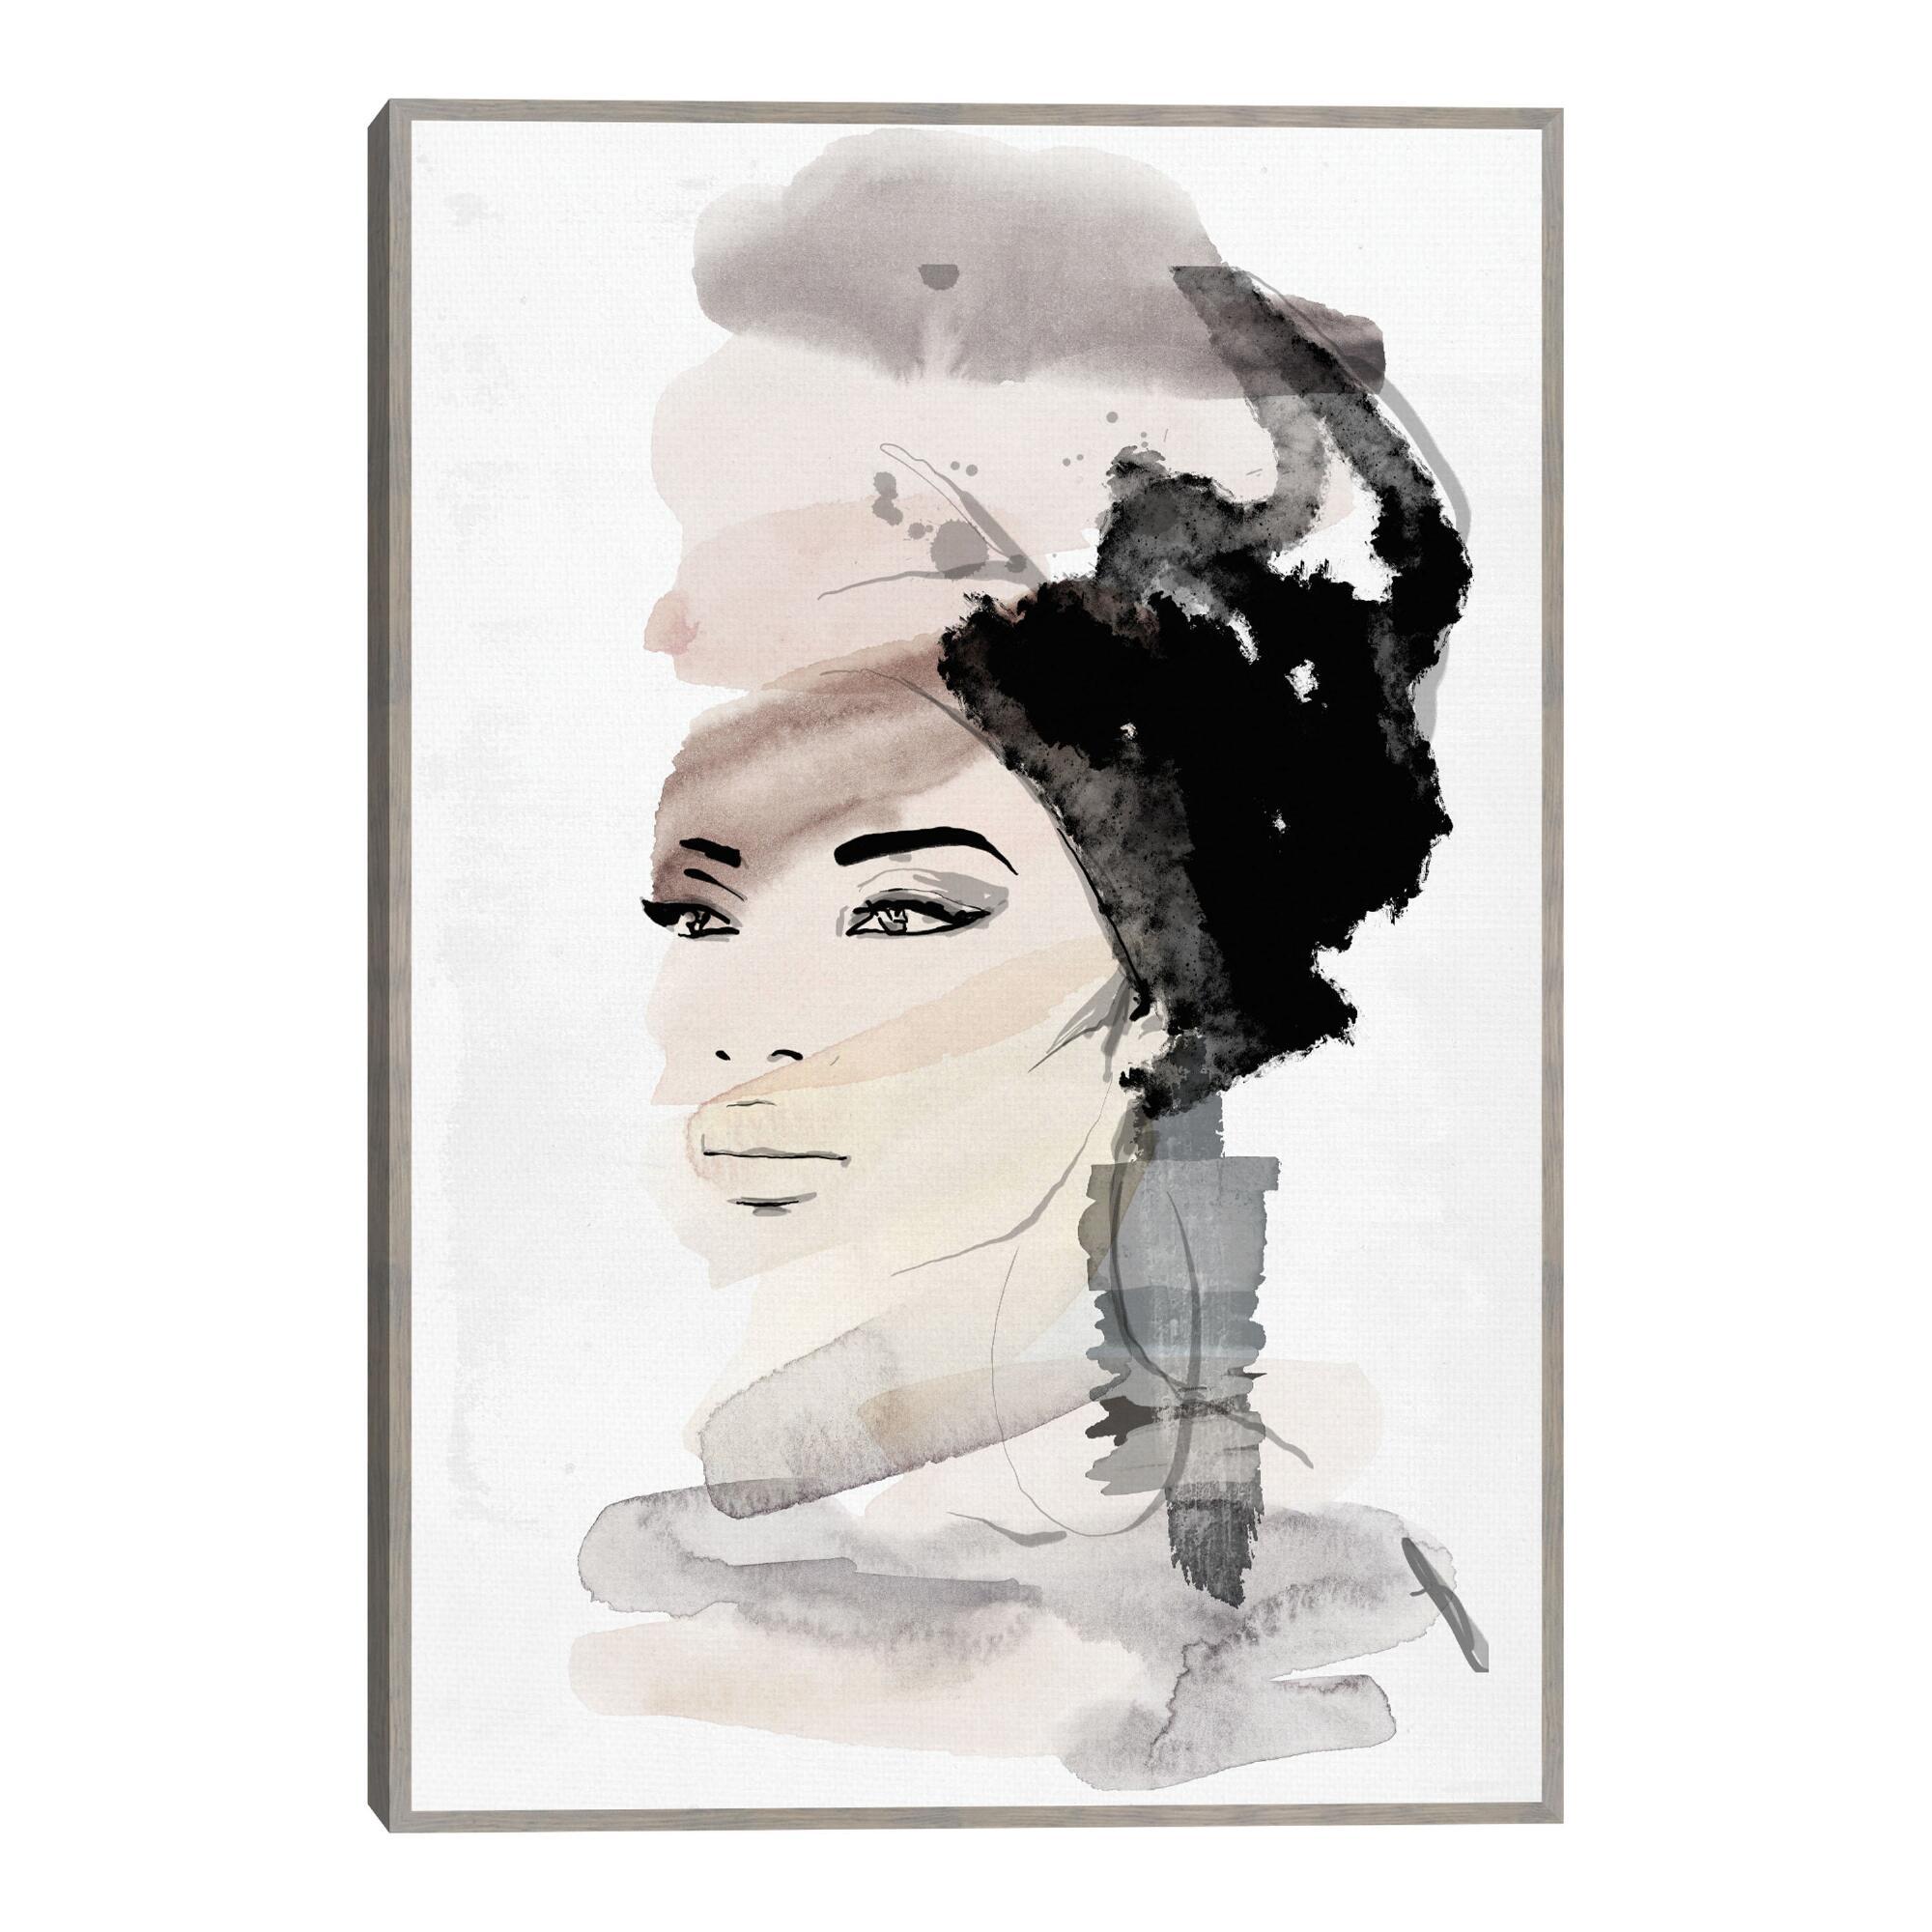 She Likes Water By Nikki Chu Framed Canvas Wall Art $99.99